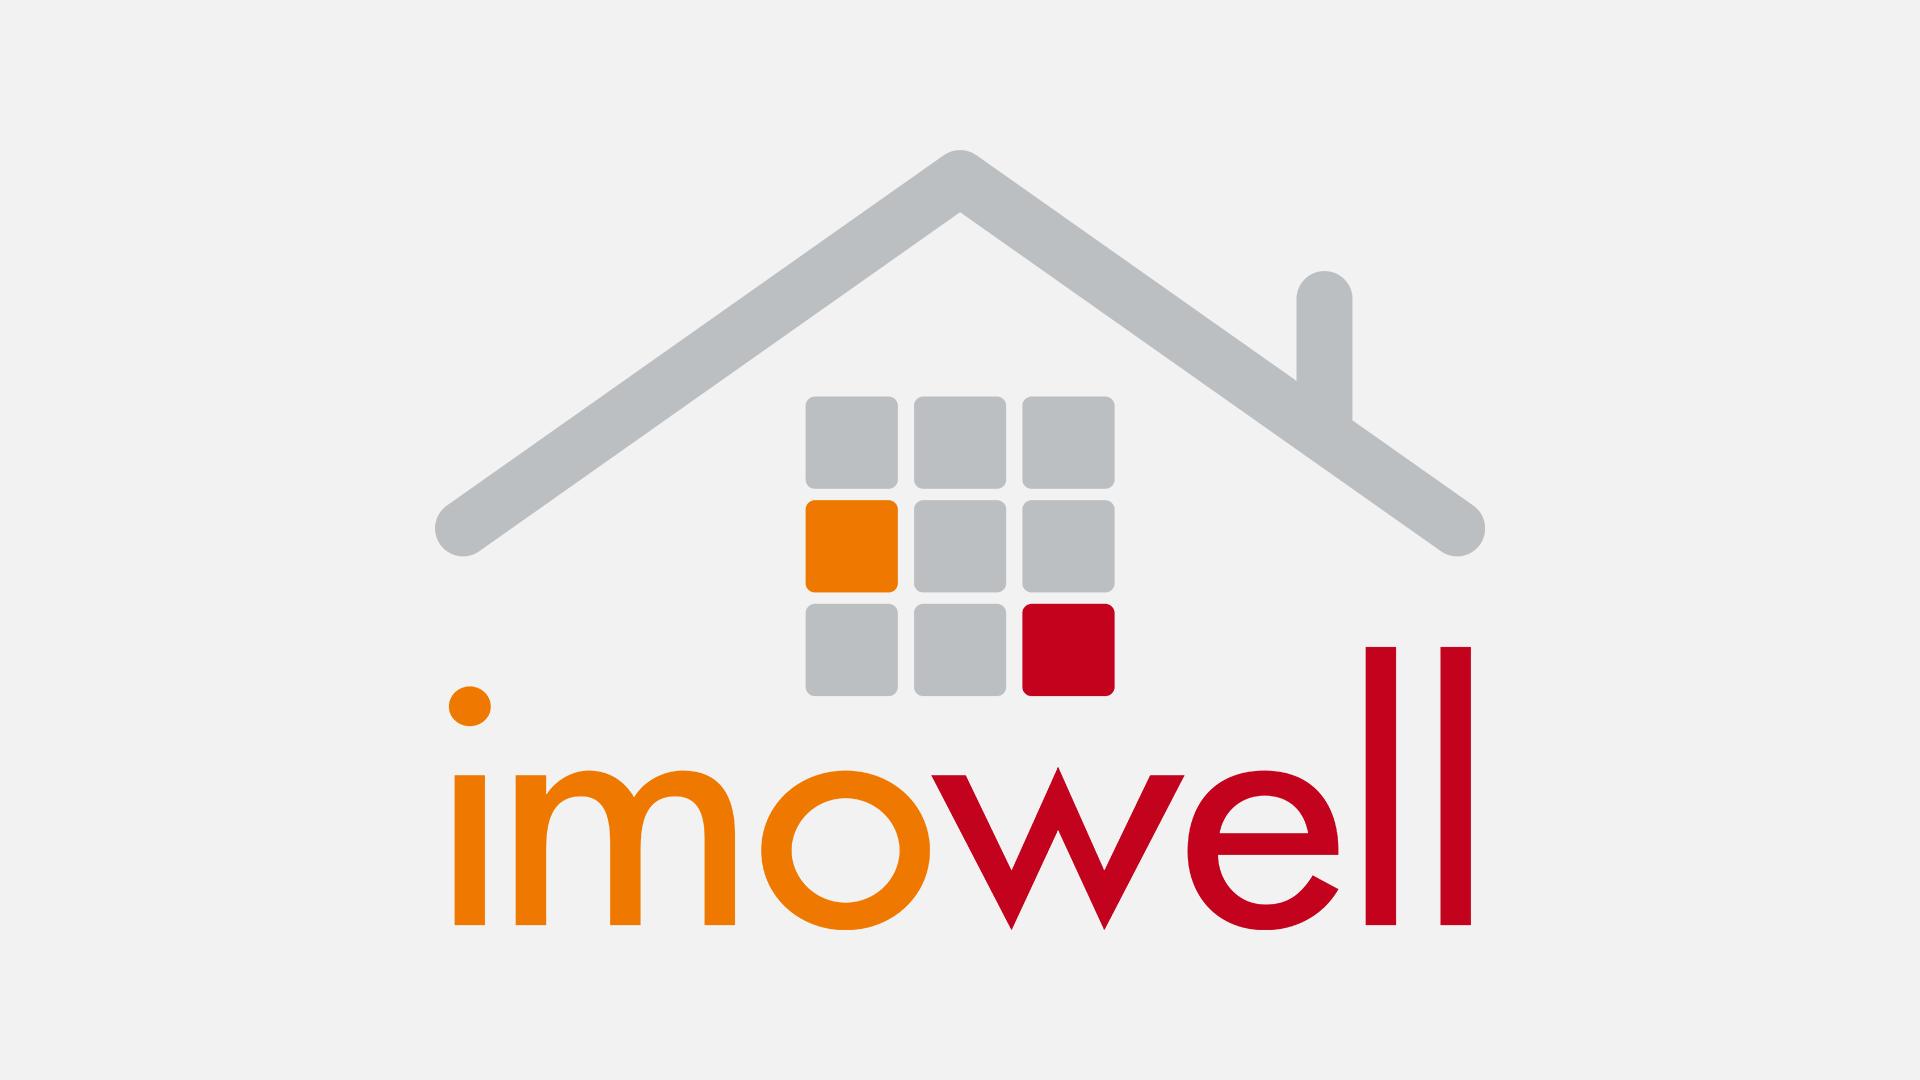 Logo imowell